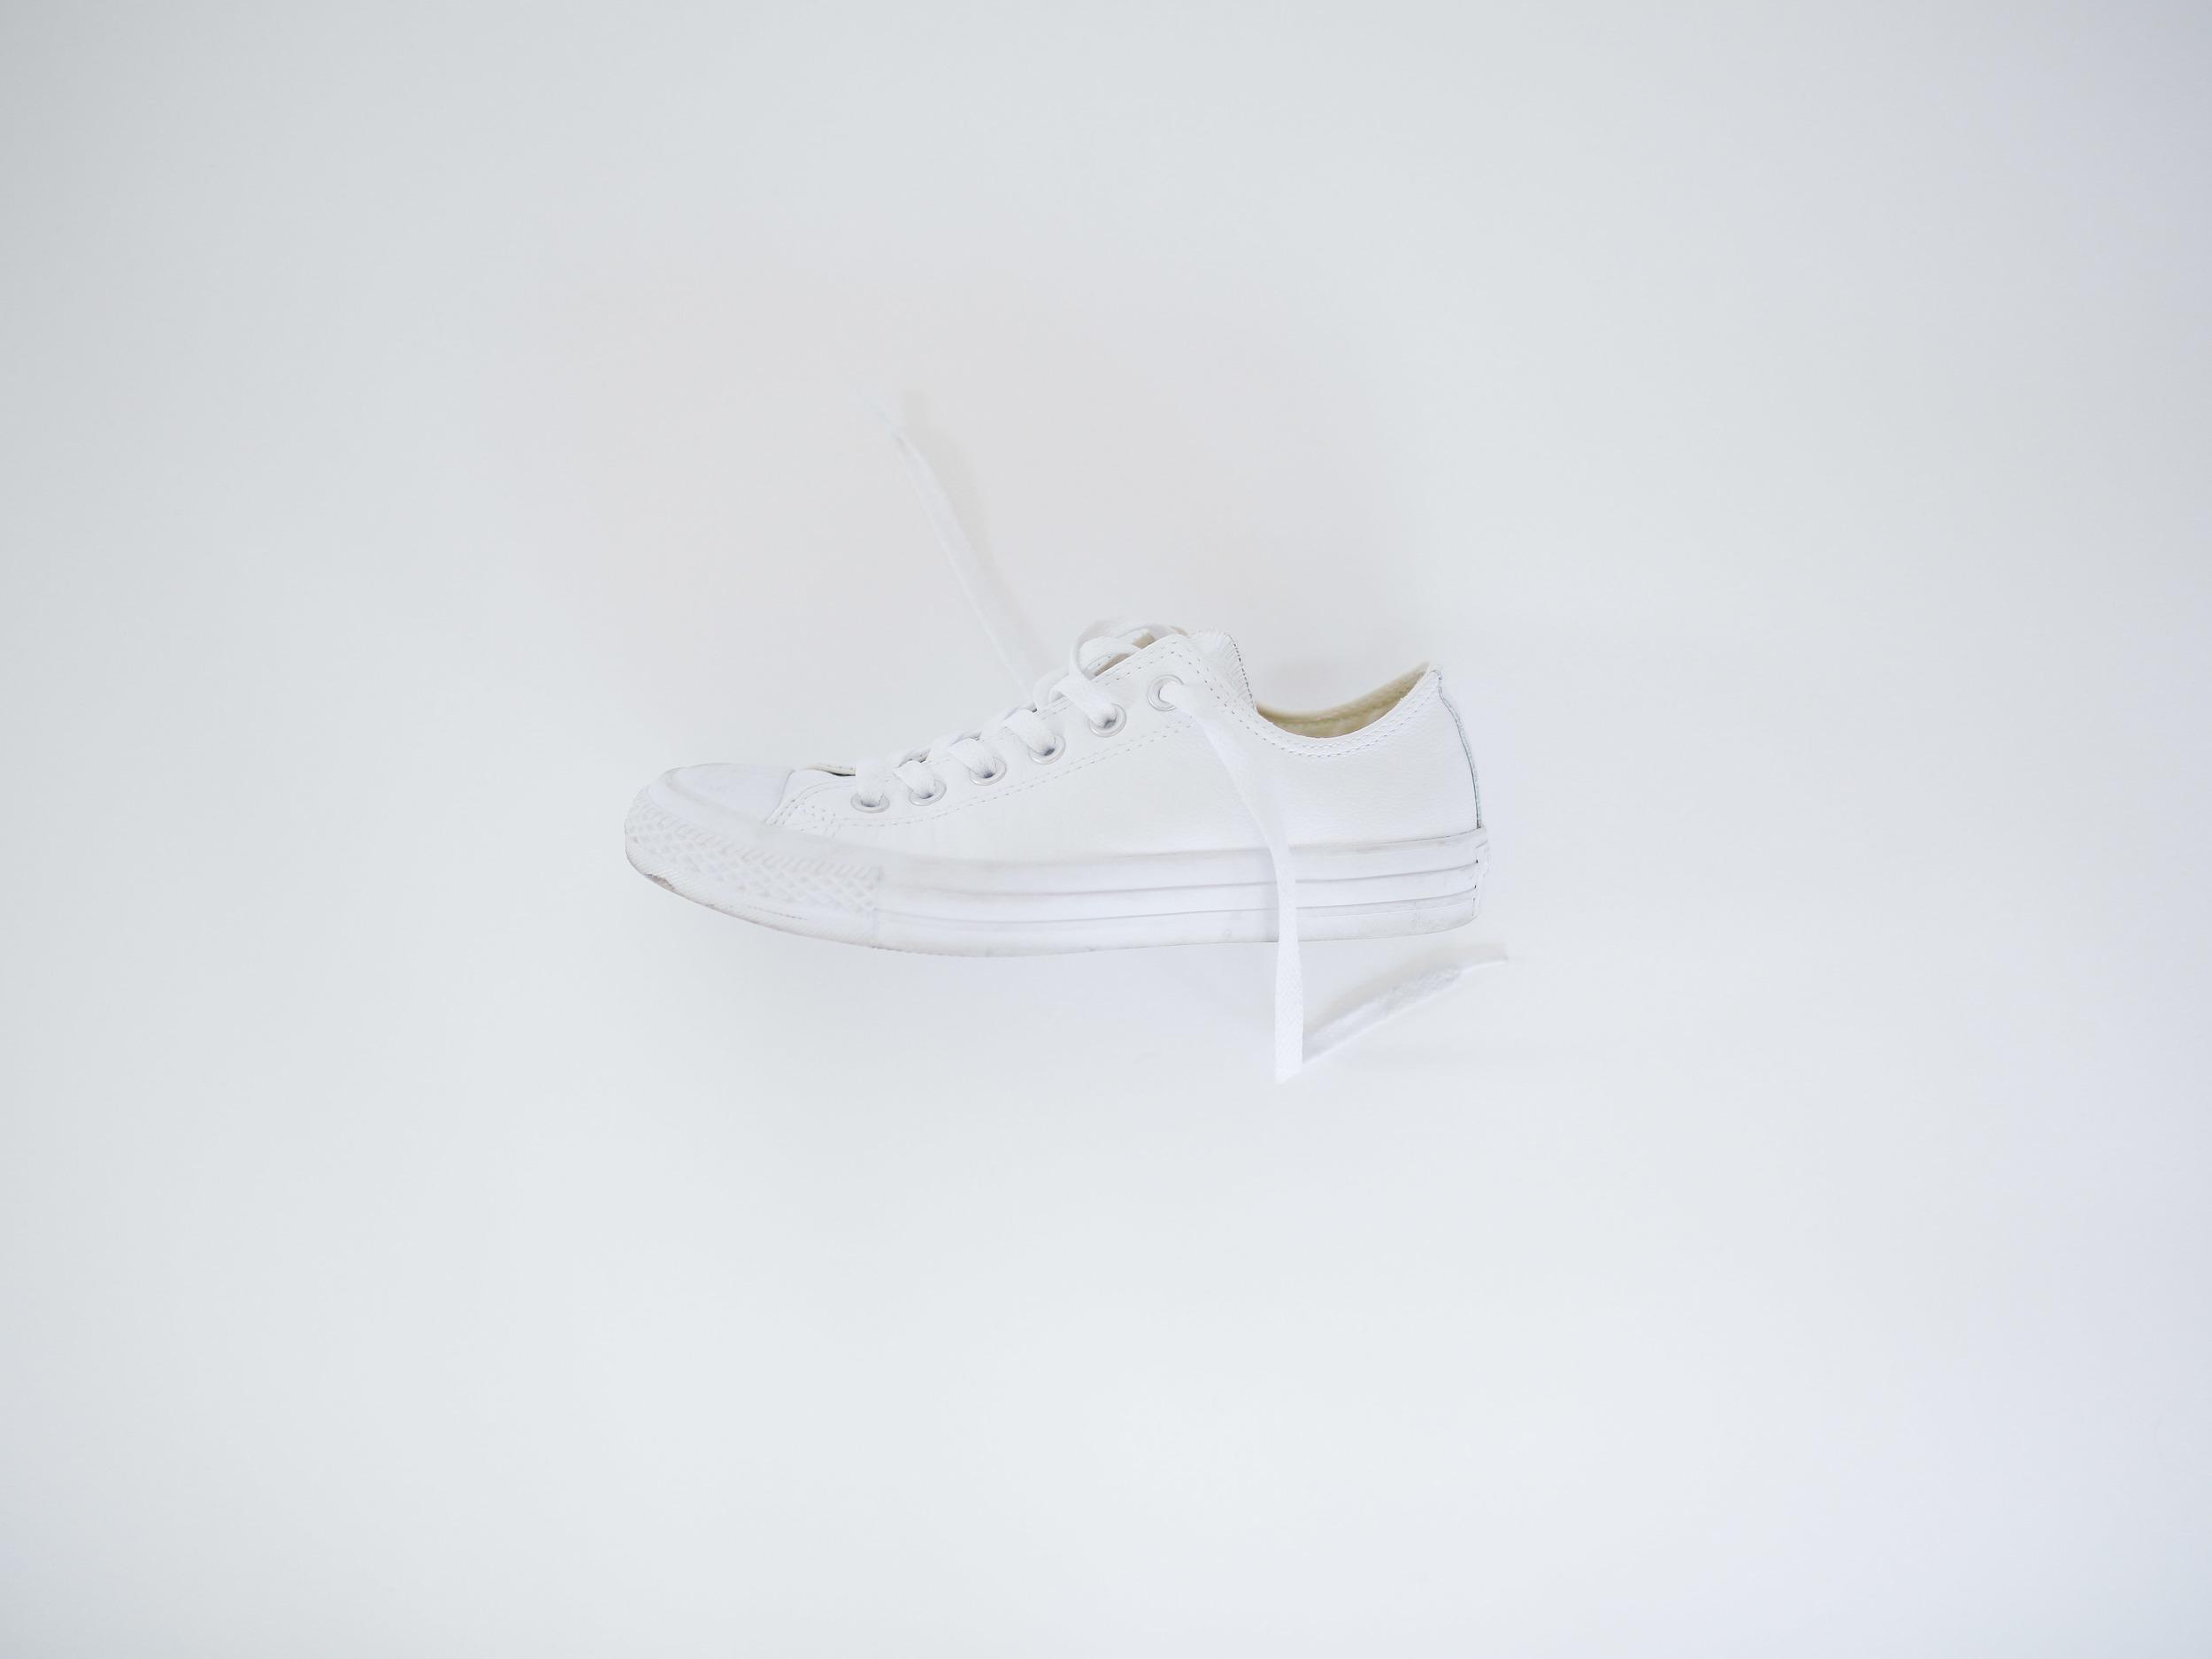 Edited White Series (2 of 9).jpg